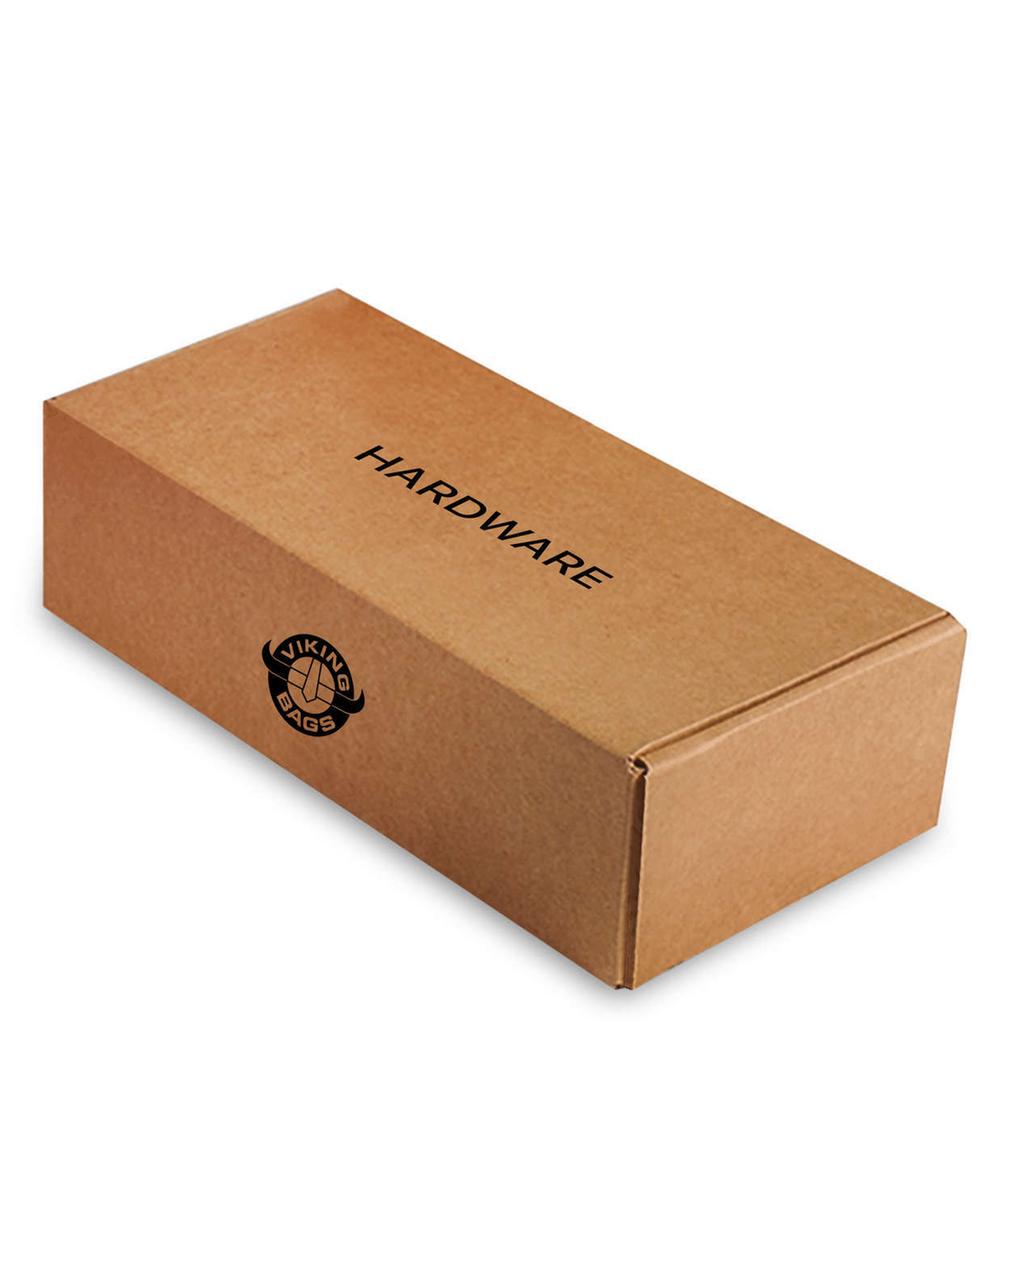 Honda VTX 1800 C Viking Lamellar Extra Large Shock Cutout Saddlebag box